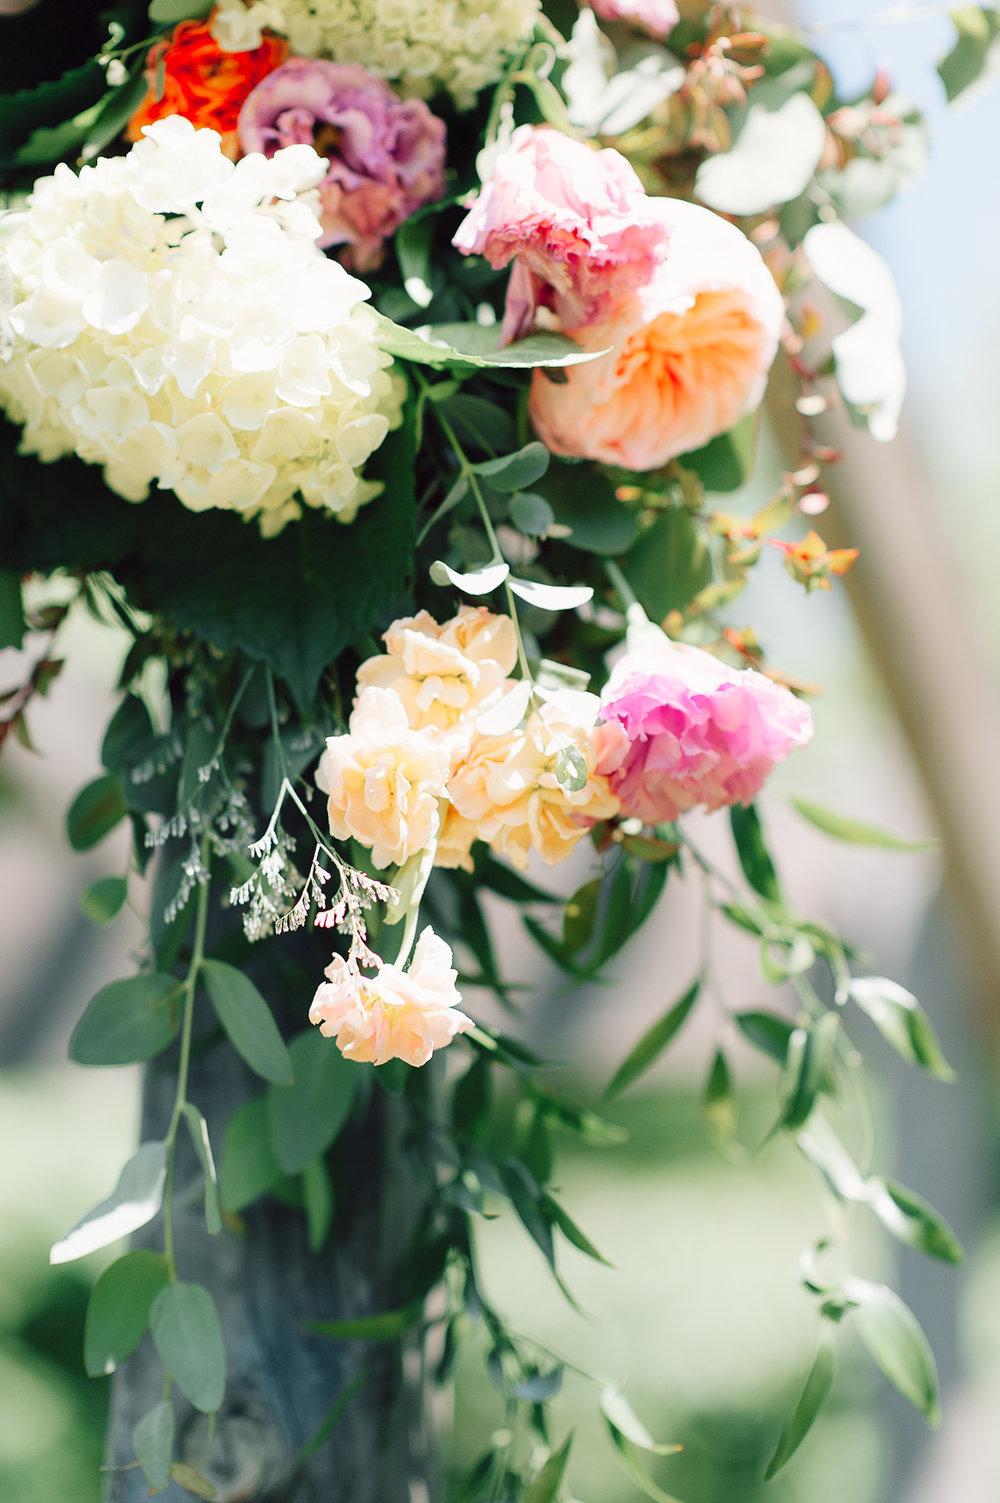 virginiawedding_theGlasgowFarm_rusticwedding_fredericksburg_youseephotography_CarolineDale (29).jpg